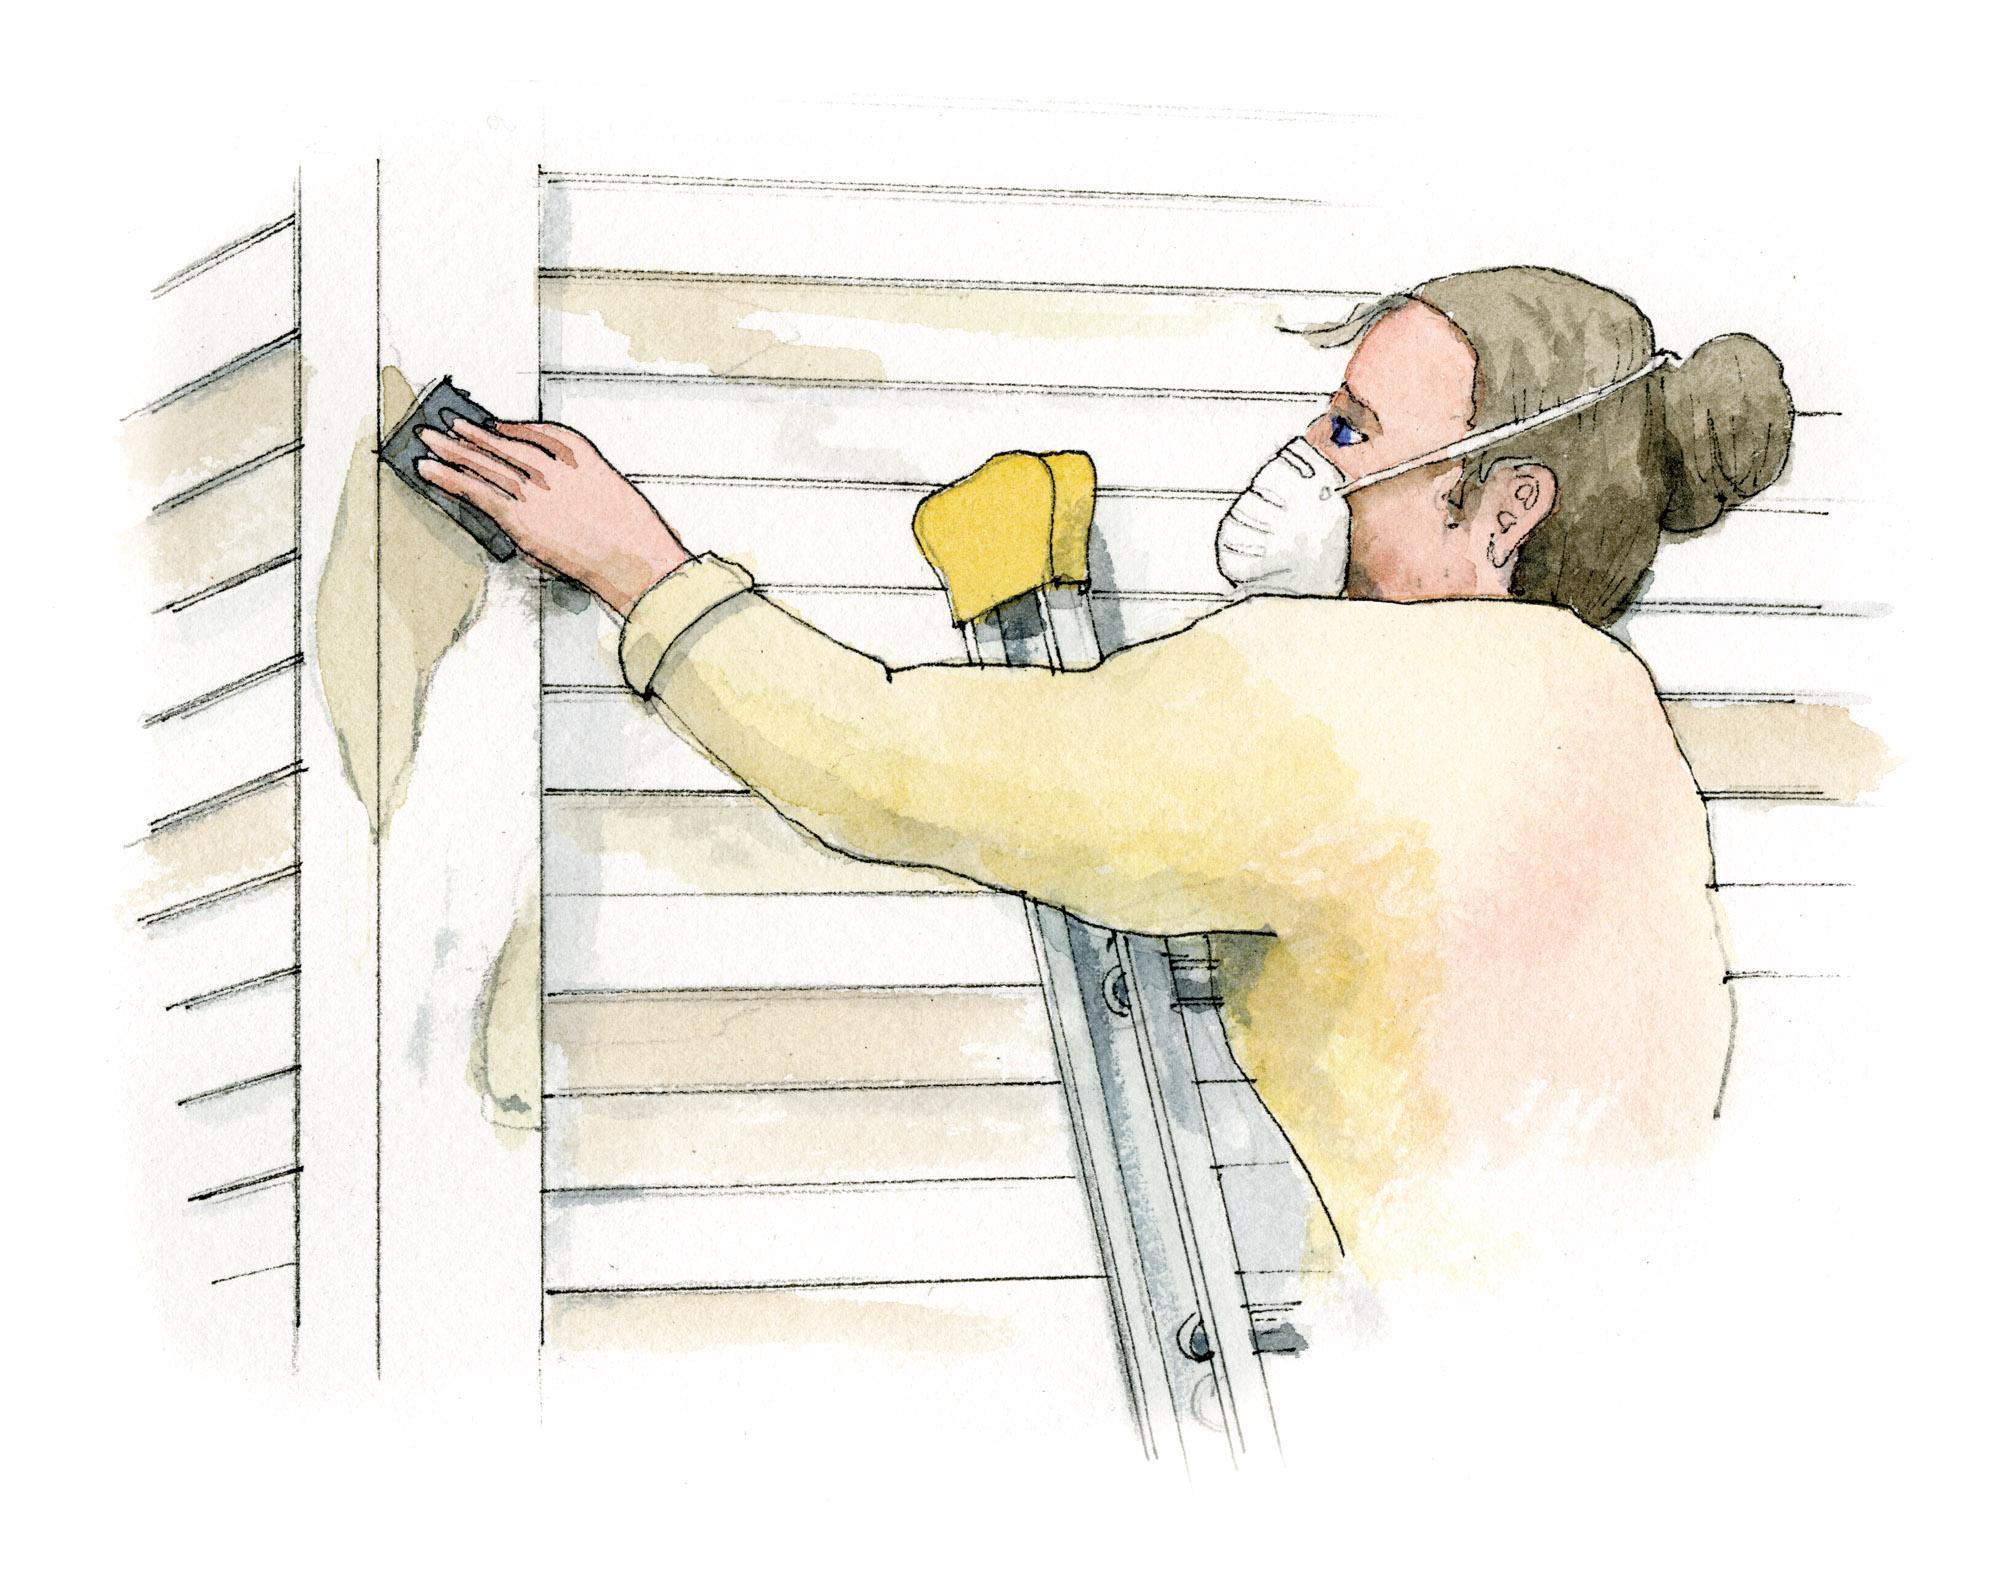 sanding exterior paint